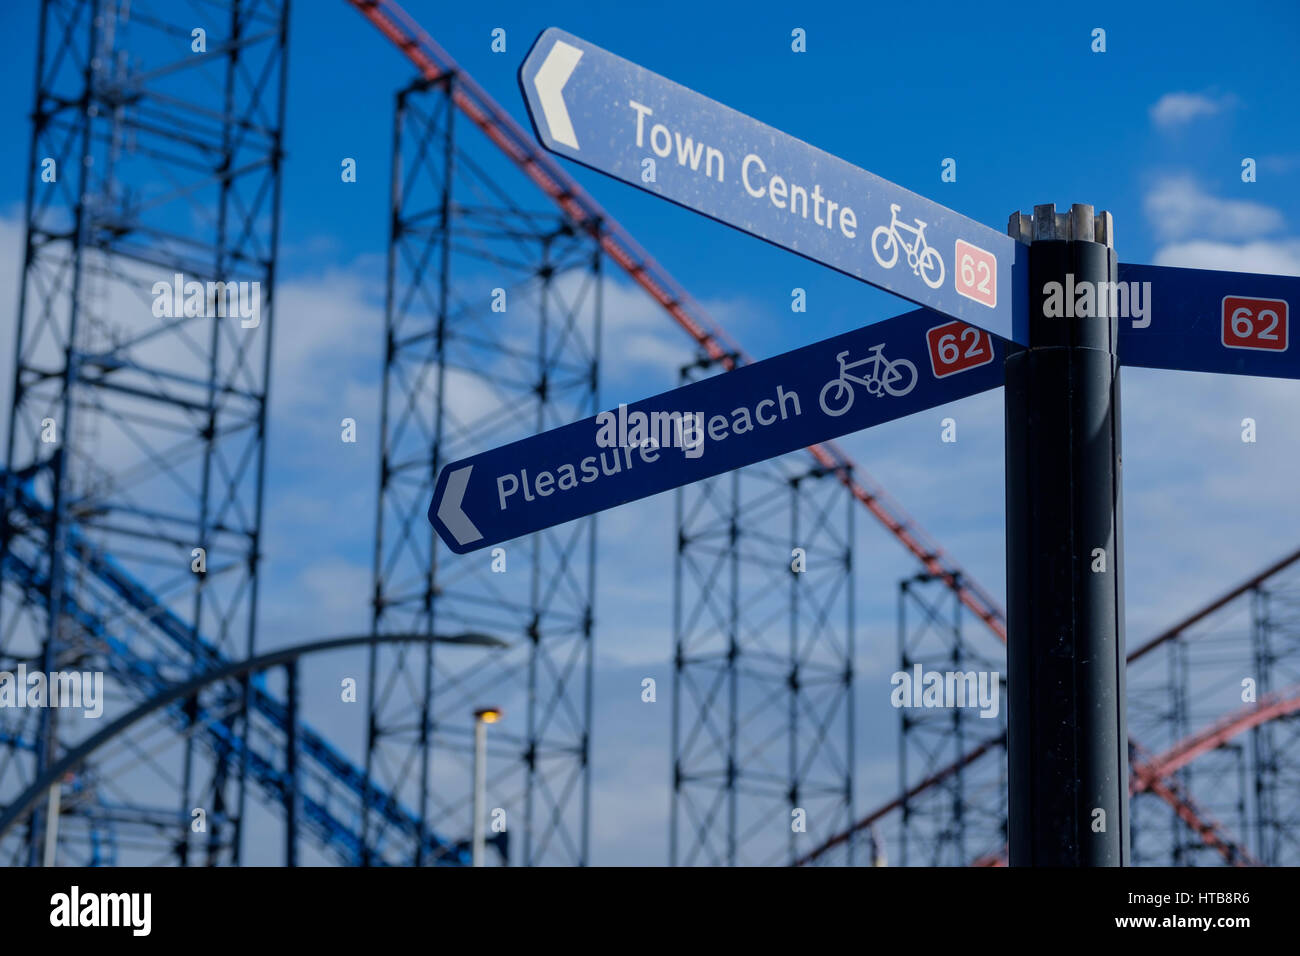 Blackpool Pleasure Beach signpost on the promenade - Stock Image